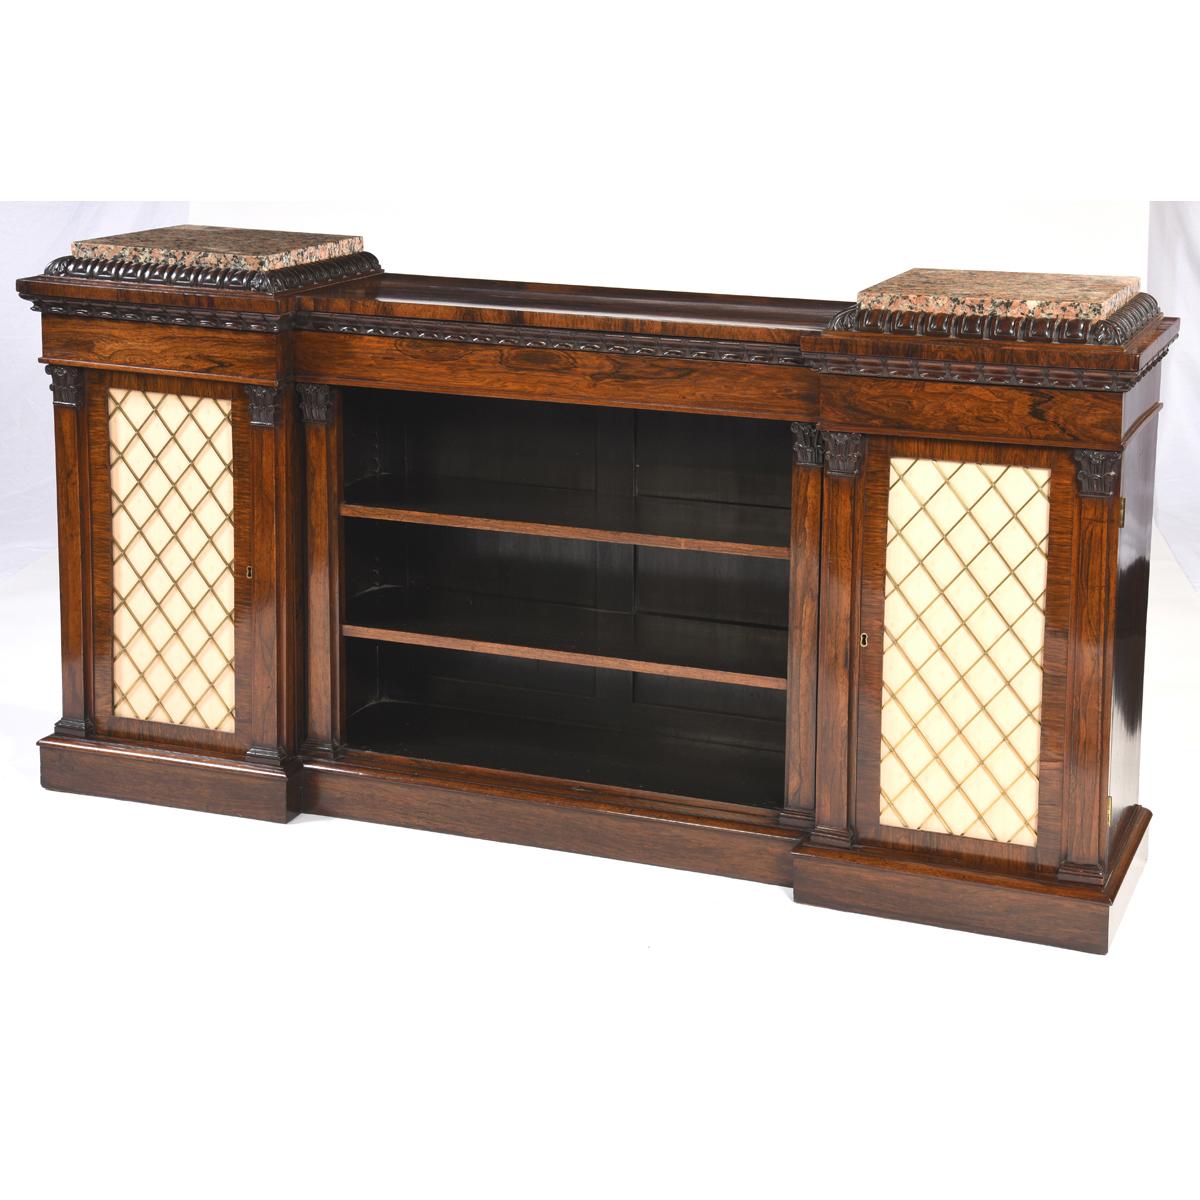 Antique English Low Bookcase